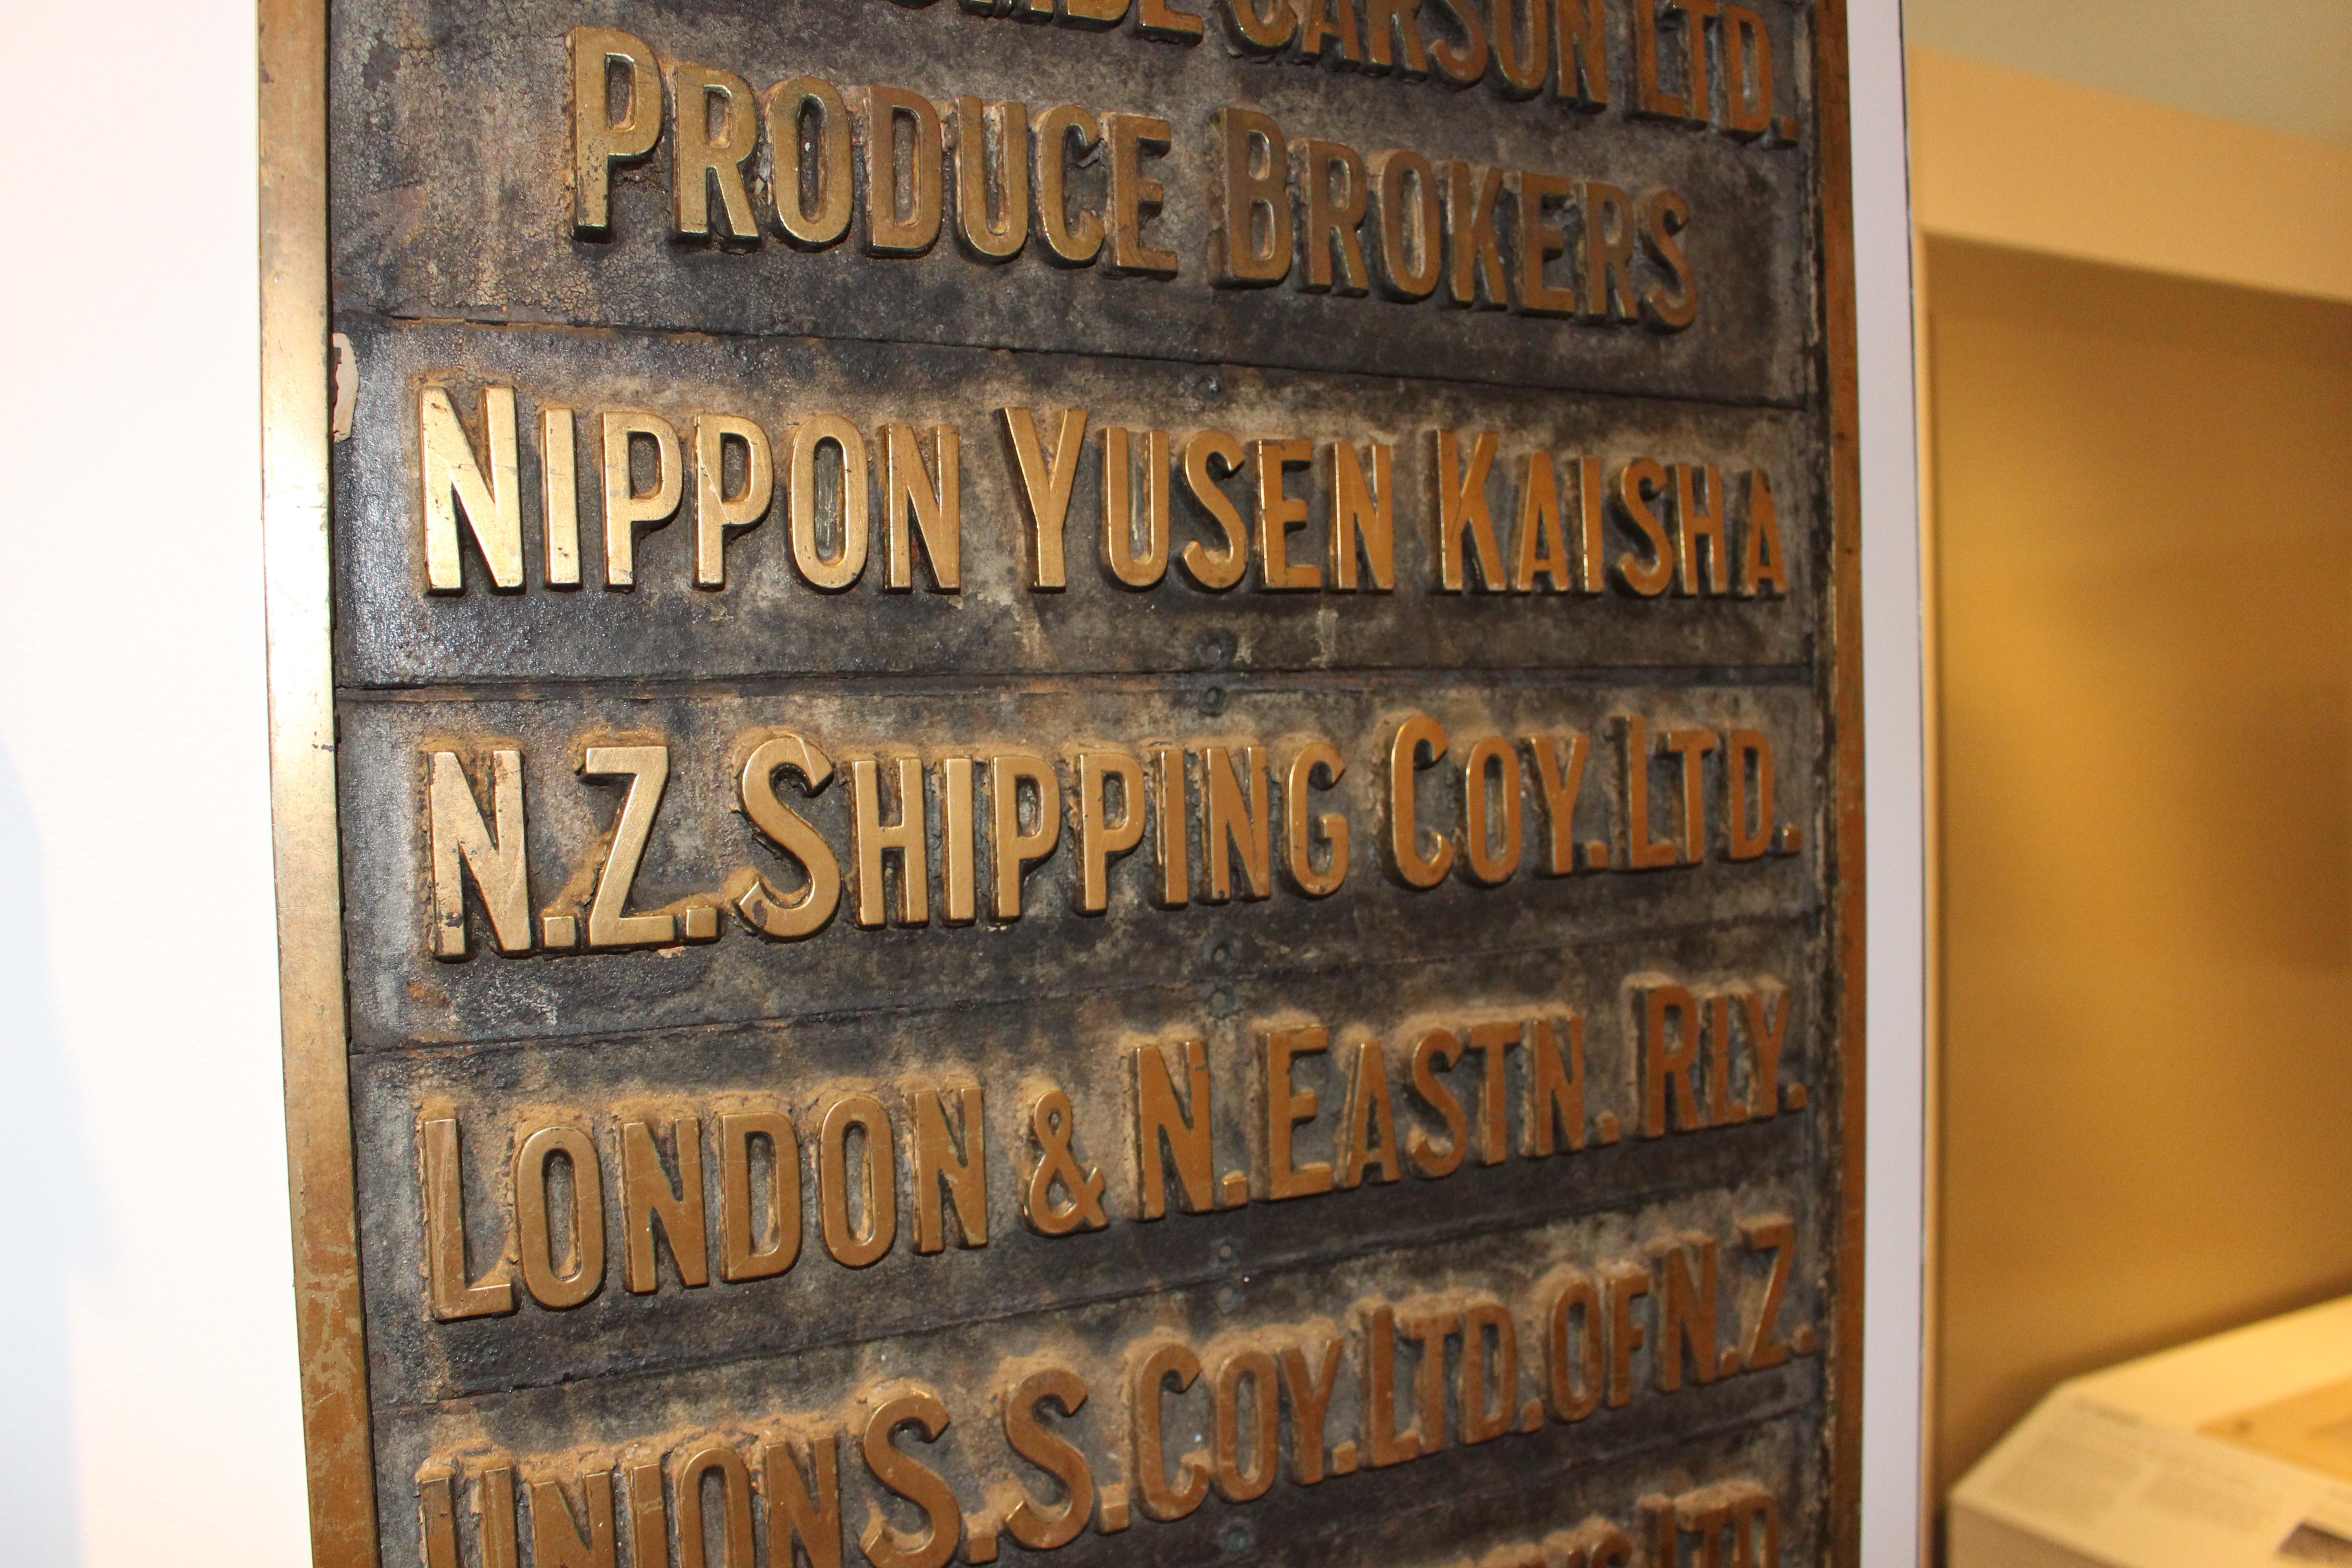 <p>ミュージアムの中にはNIPPON YUSEN KAISHA(日本郵船会社)の名前も!</p>